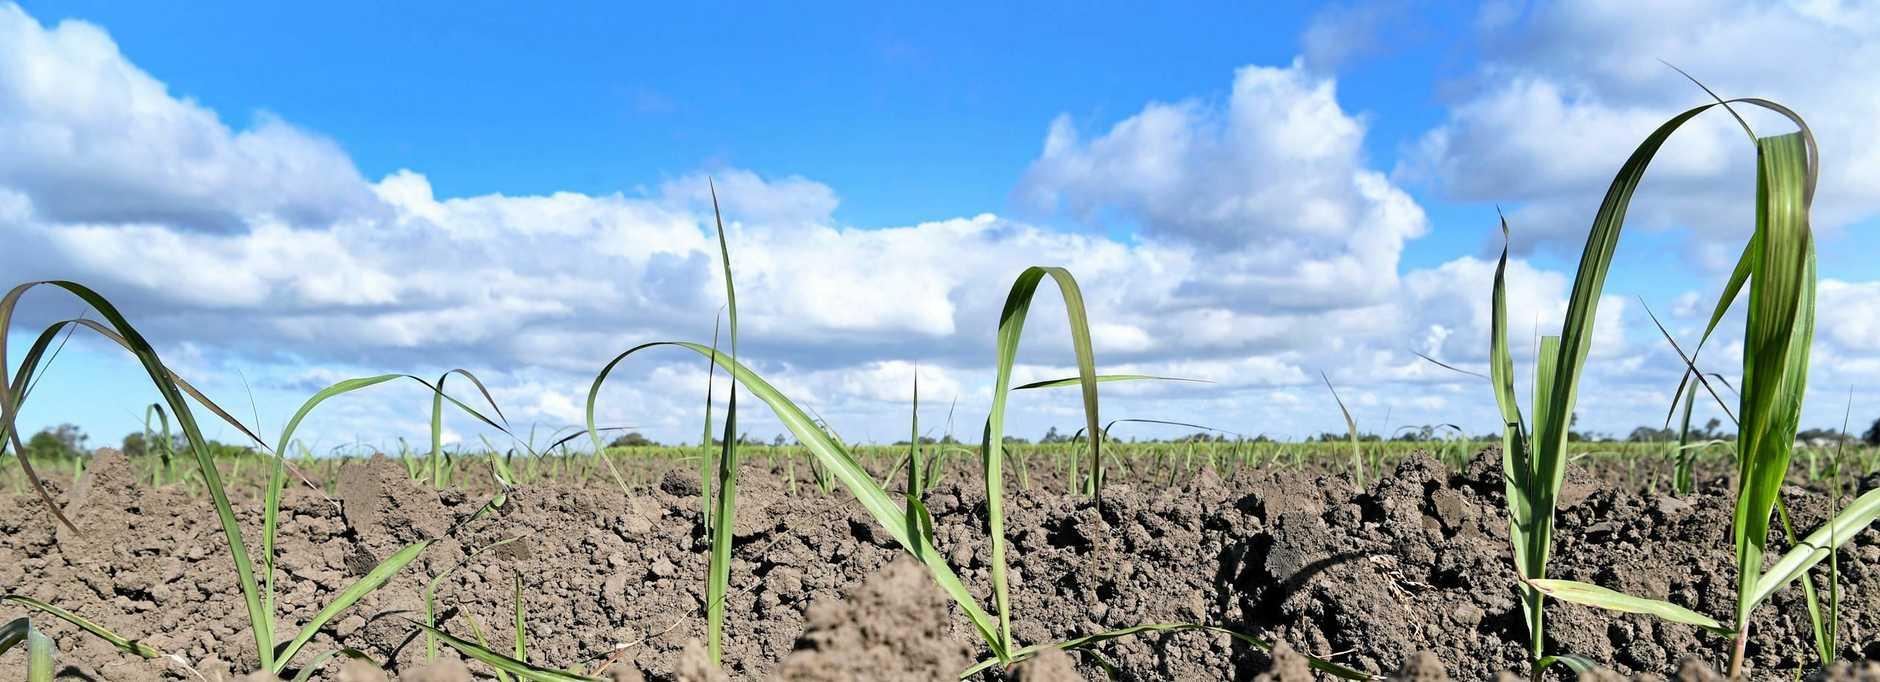 DRY BONES: Hervey Bay has endured its driest September in its history.